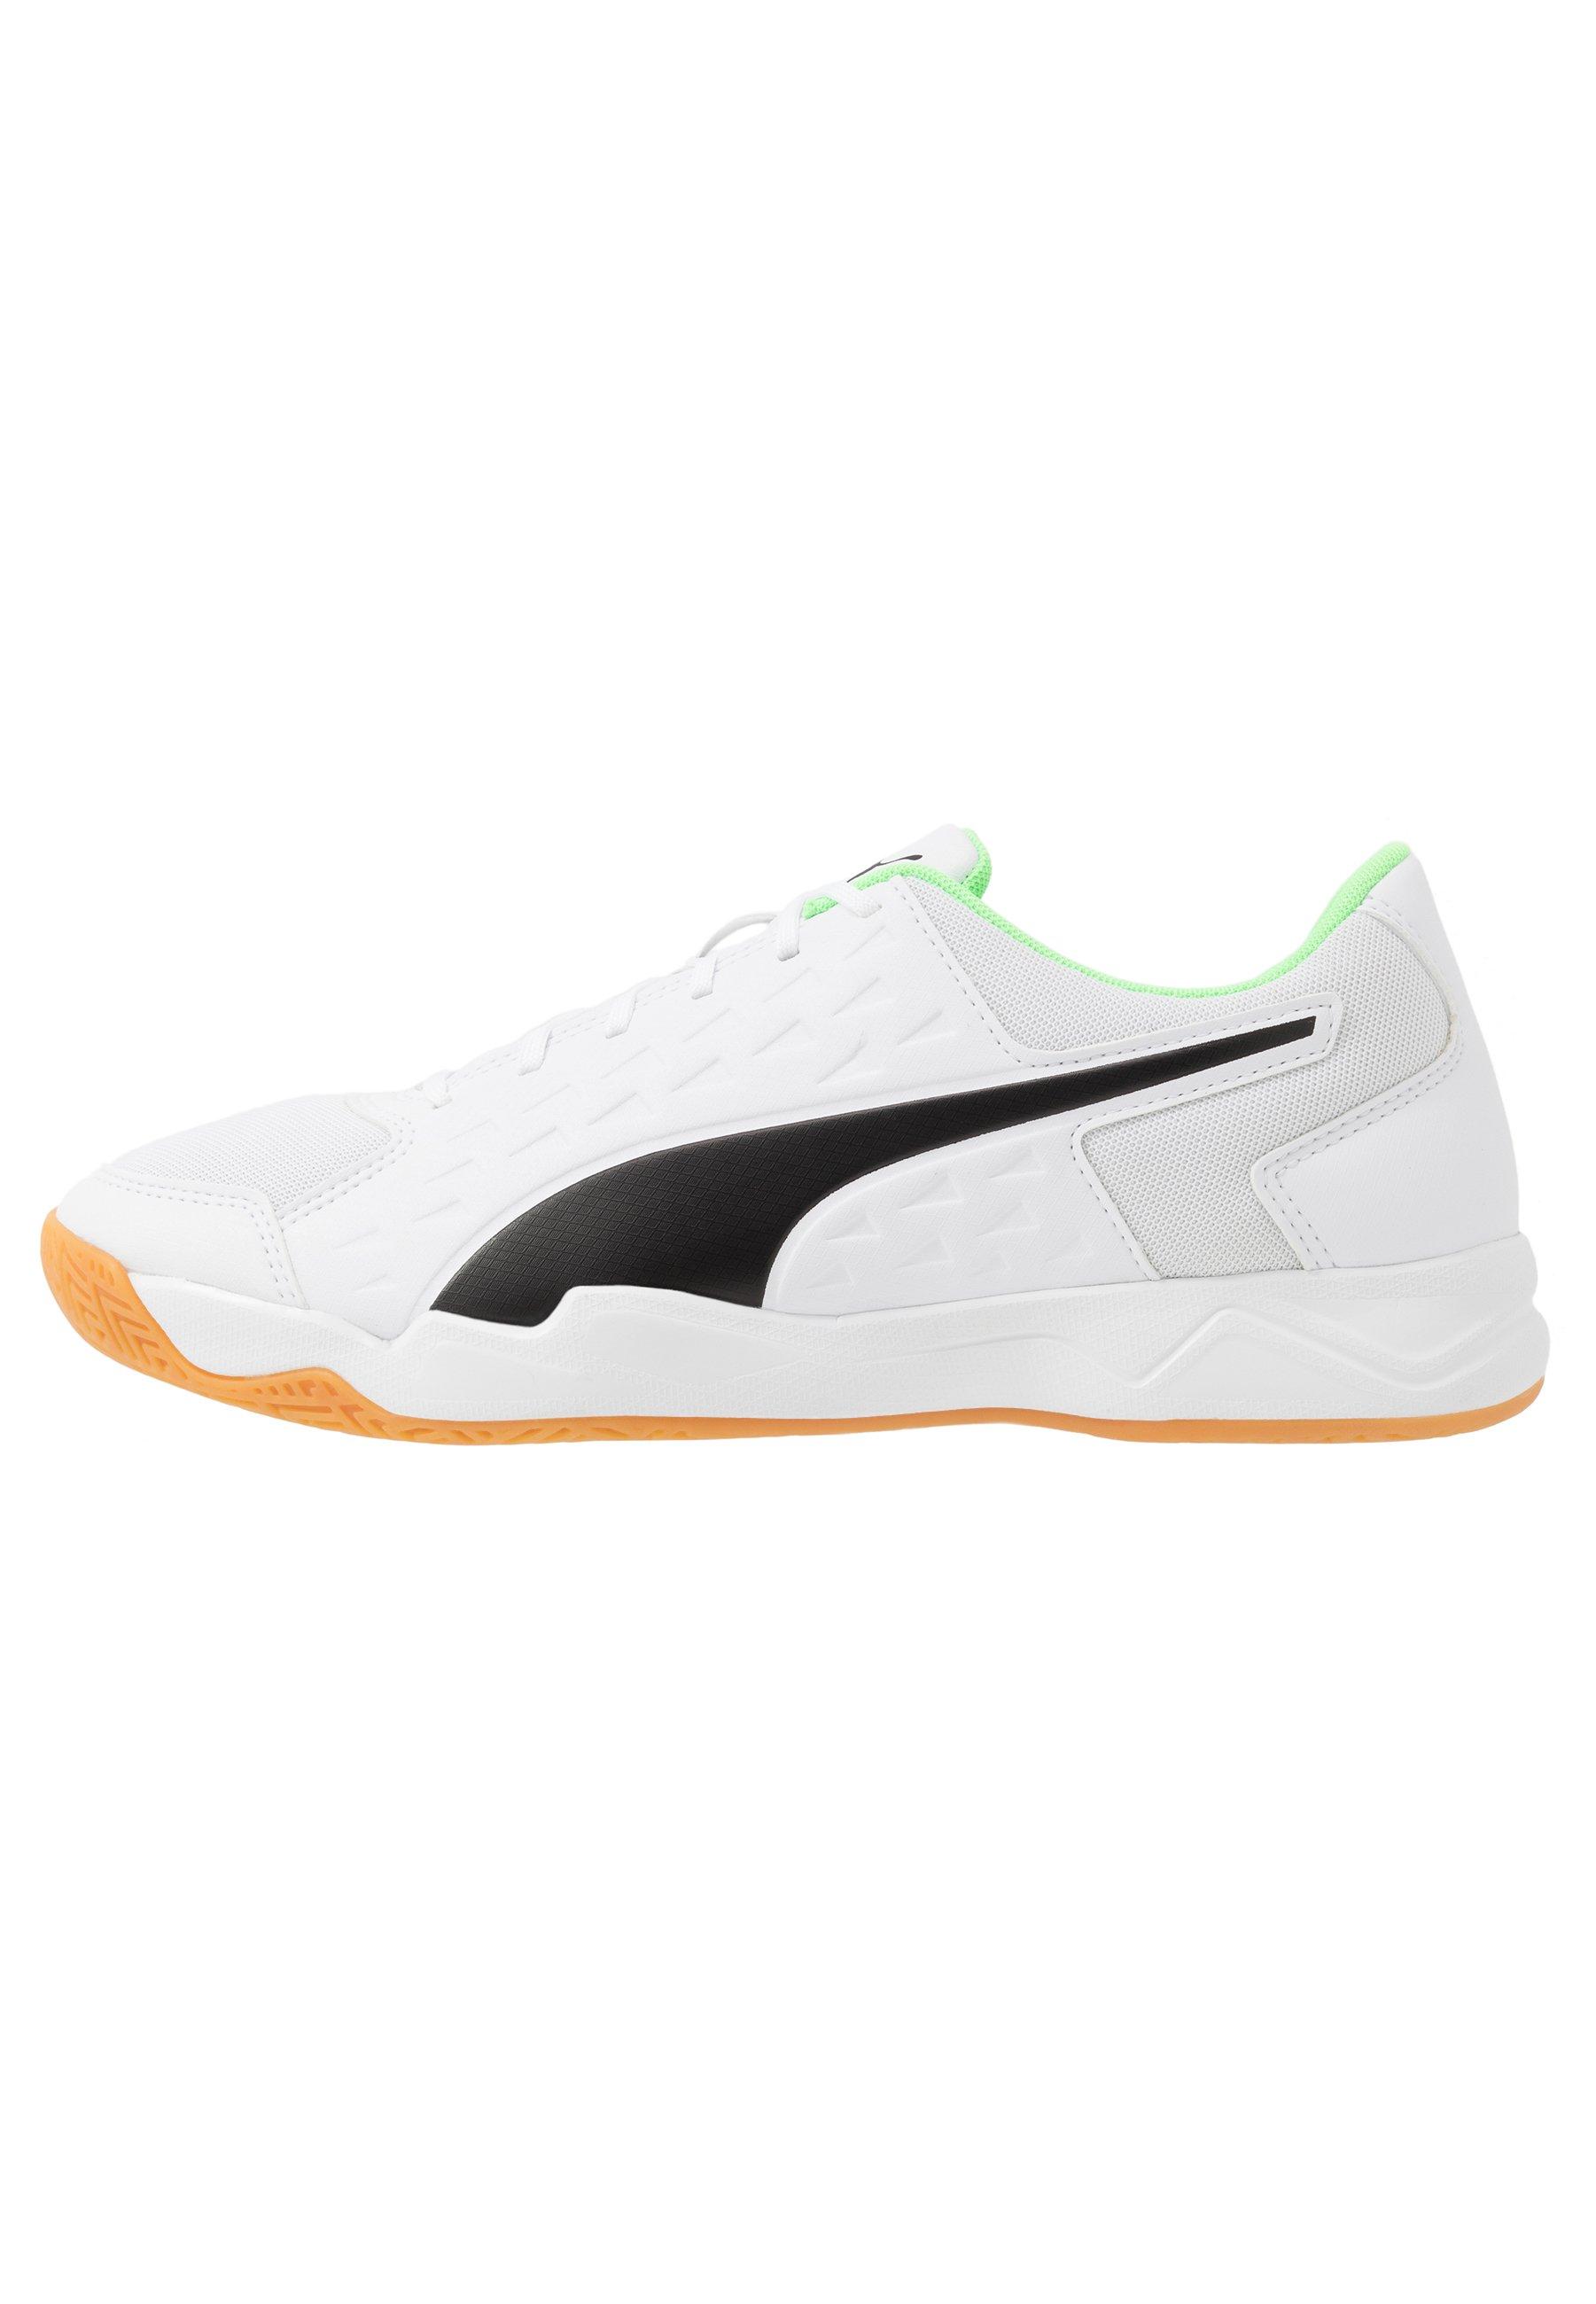 AURIZ Chaussures de handball blackwhite